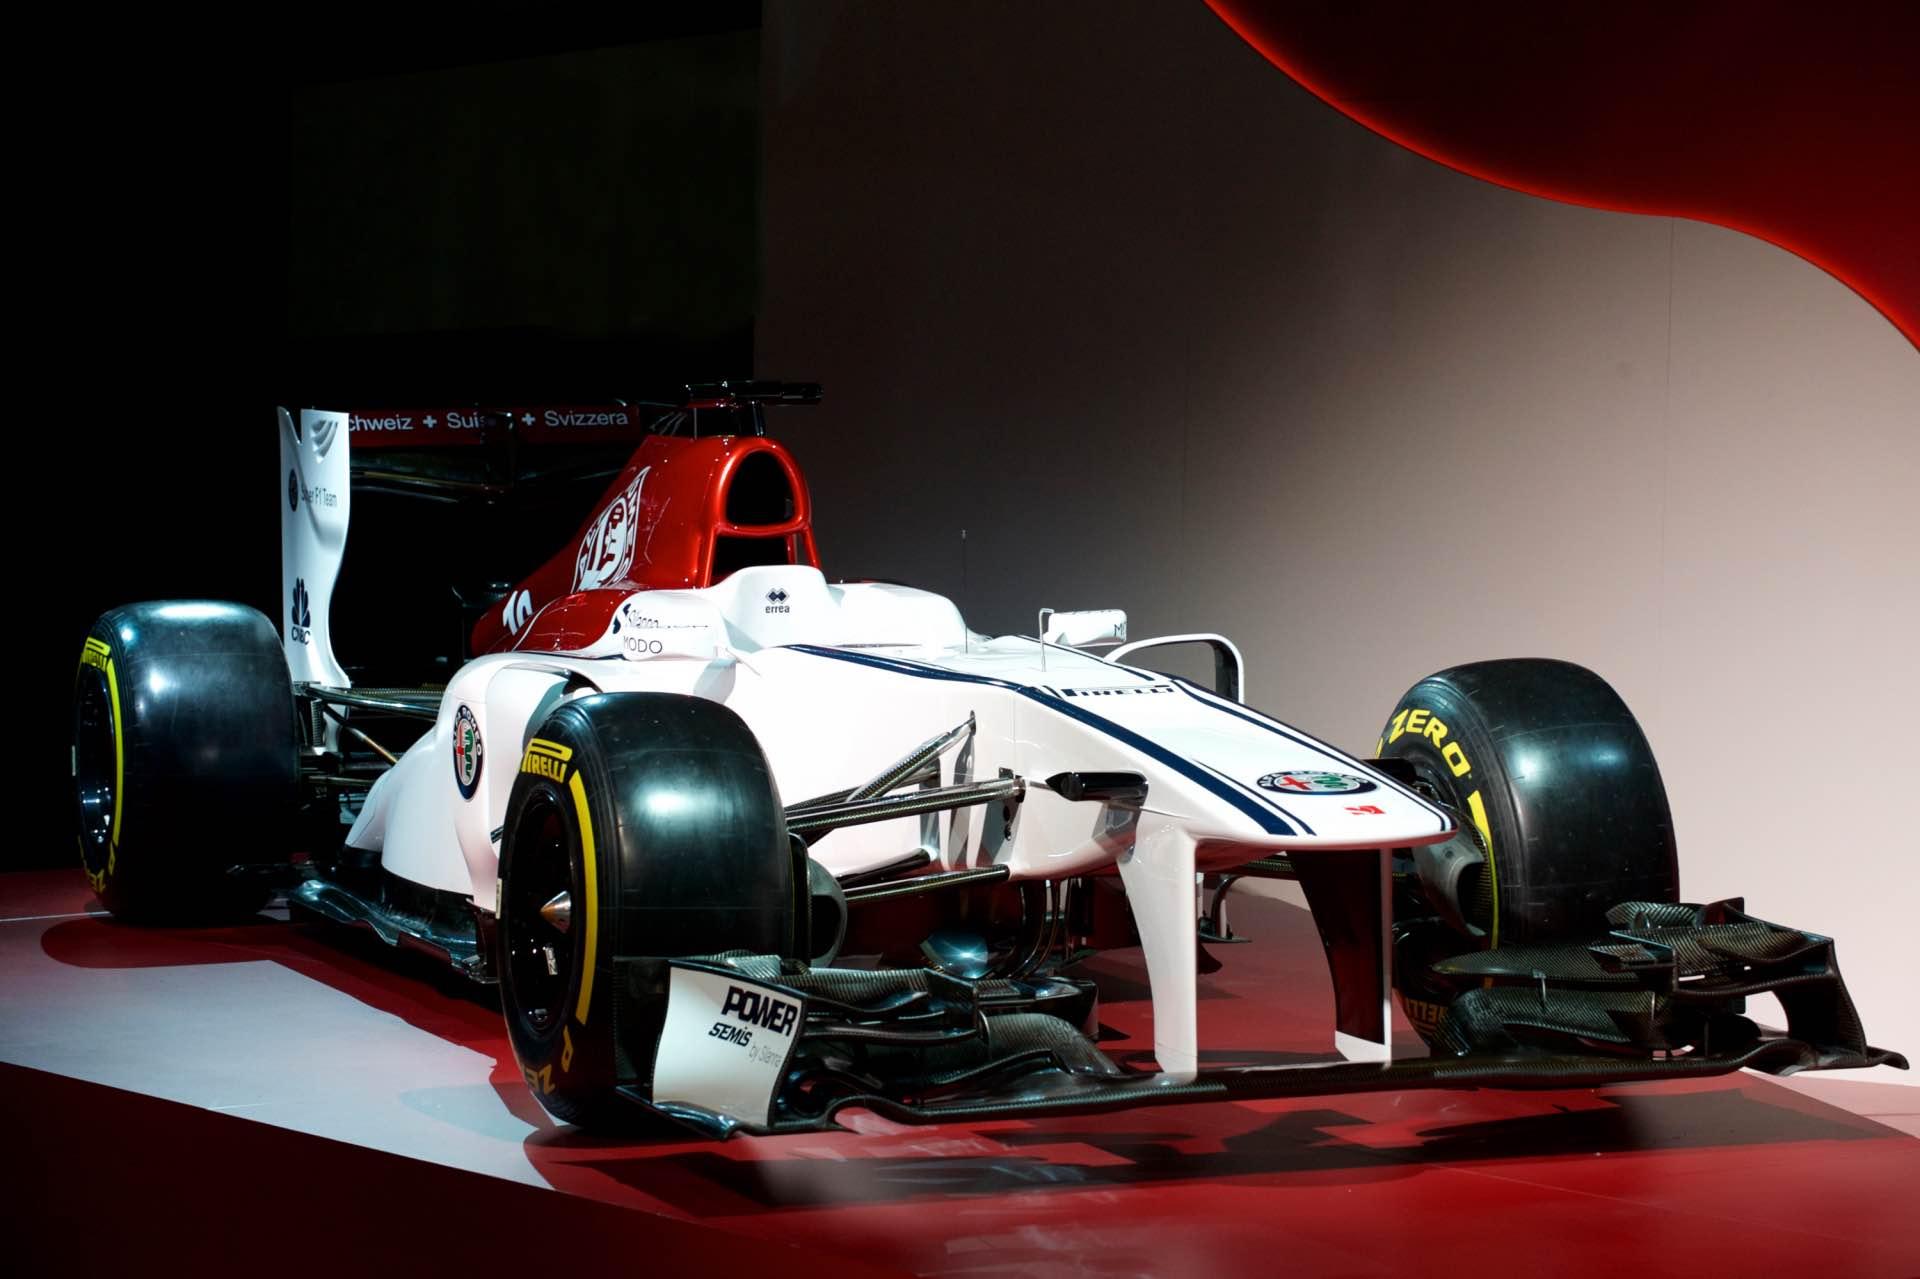 171202_Alfa-Romeo_Team-F1_05